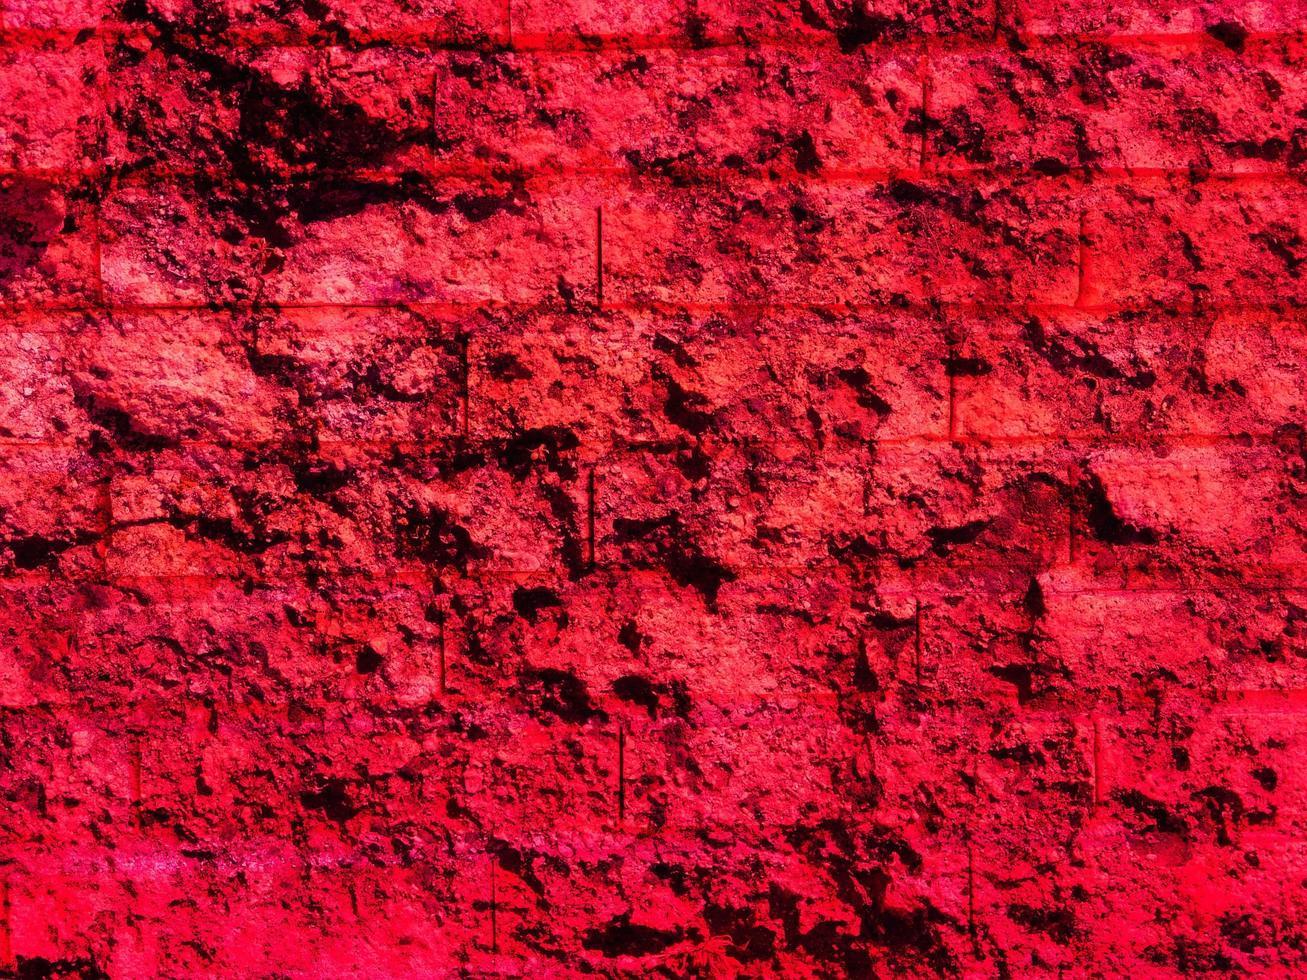 lila Stein Textur foto